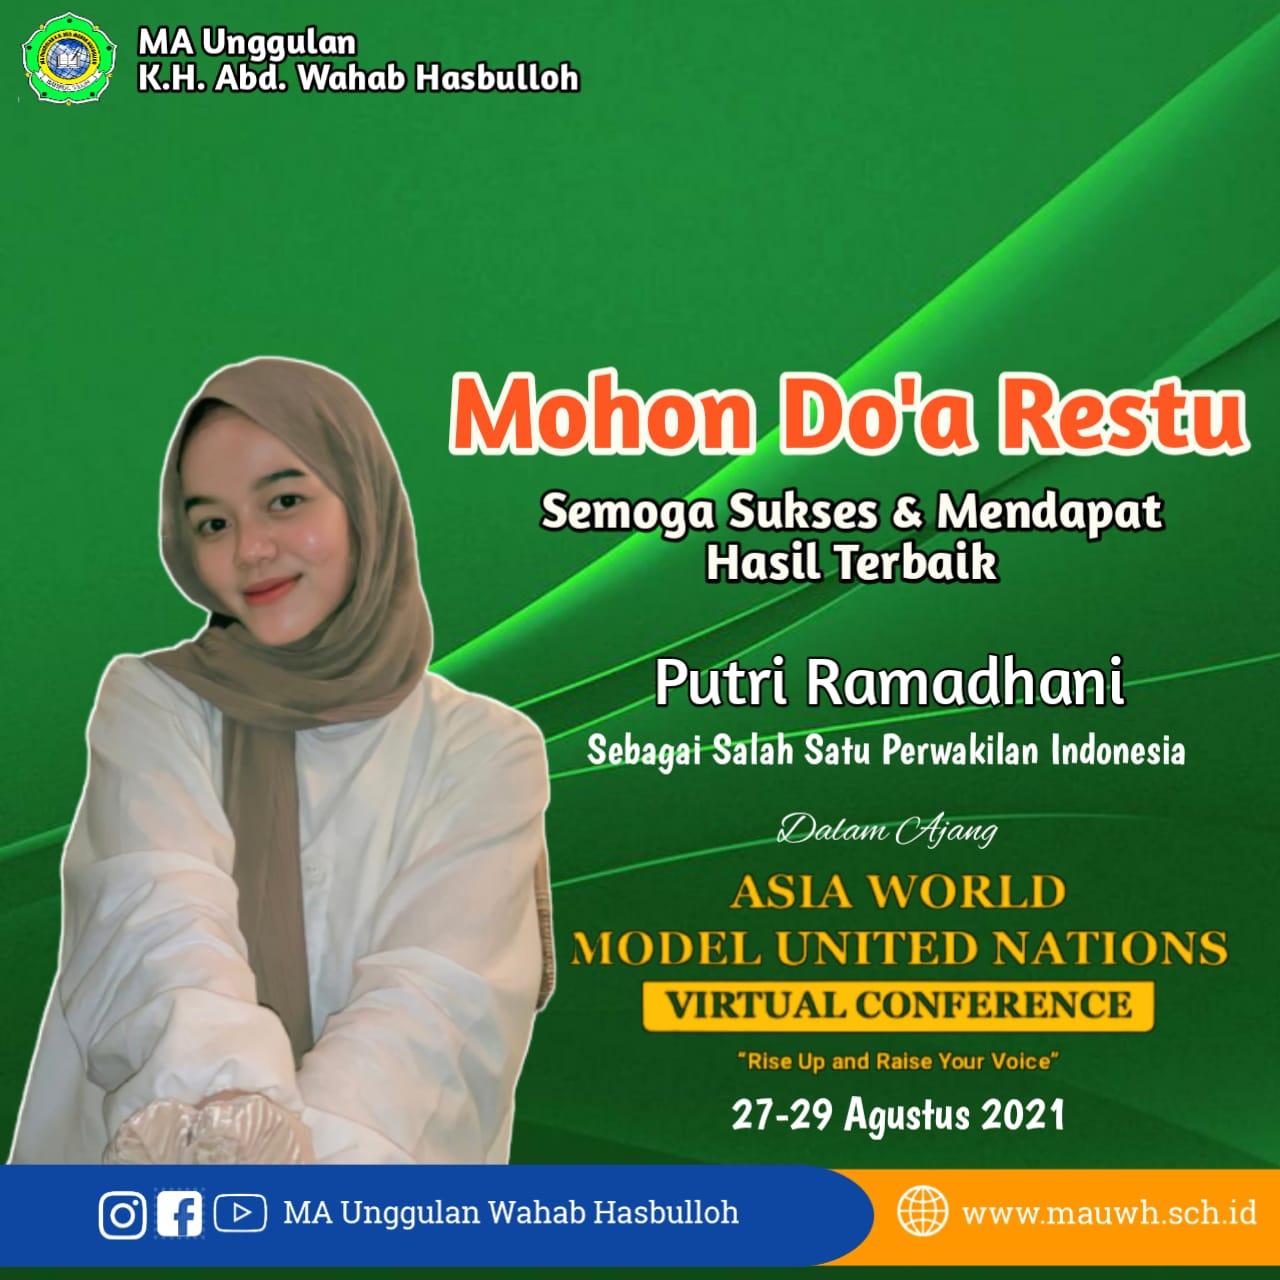 Putri Ramadhani, Siswi MAUWH, Delegasi Muda dalam Asia World Model United Nations Virtual Conference 2021